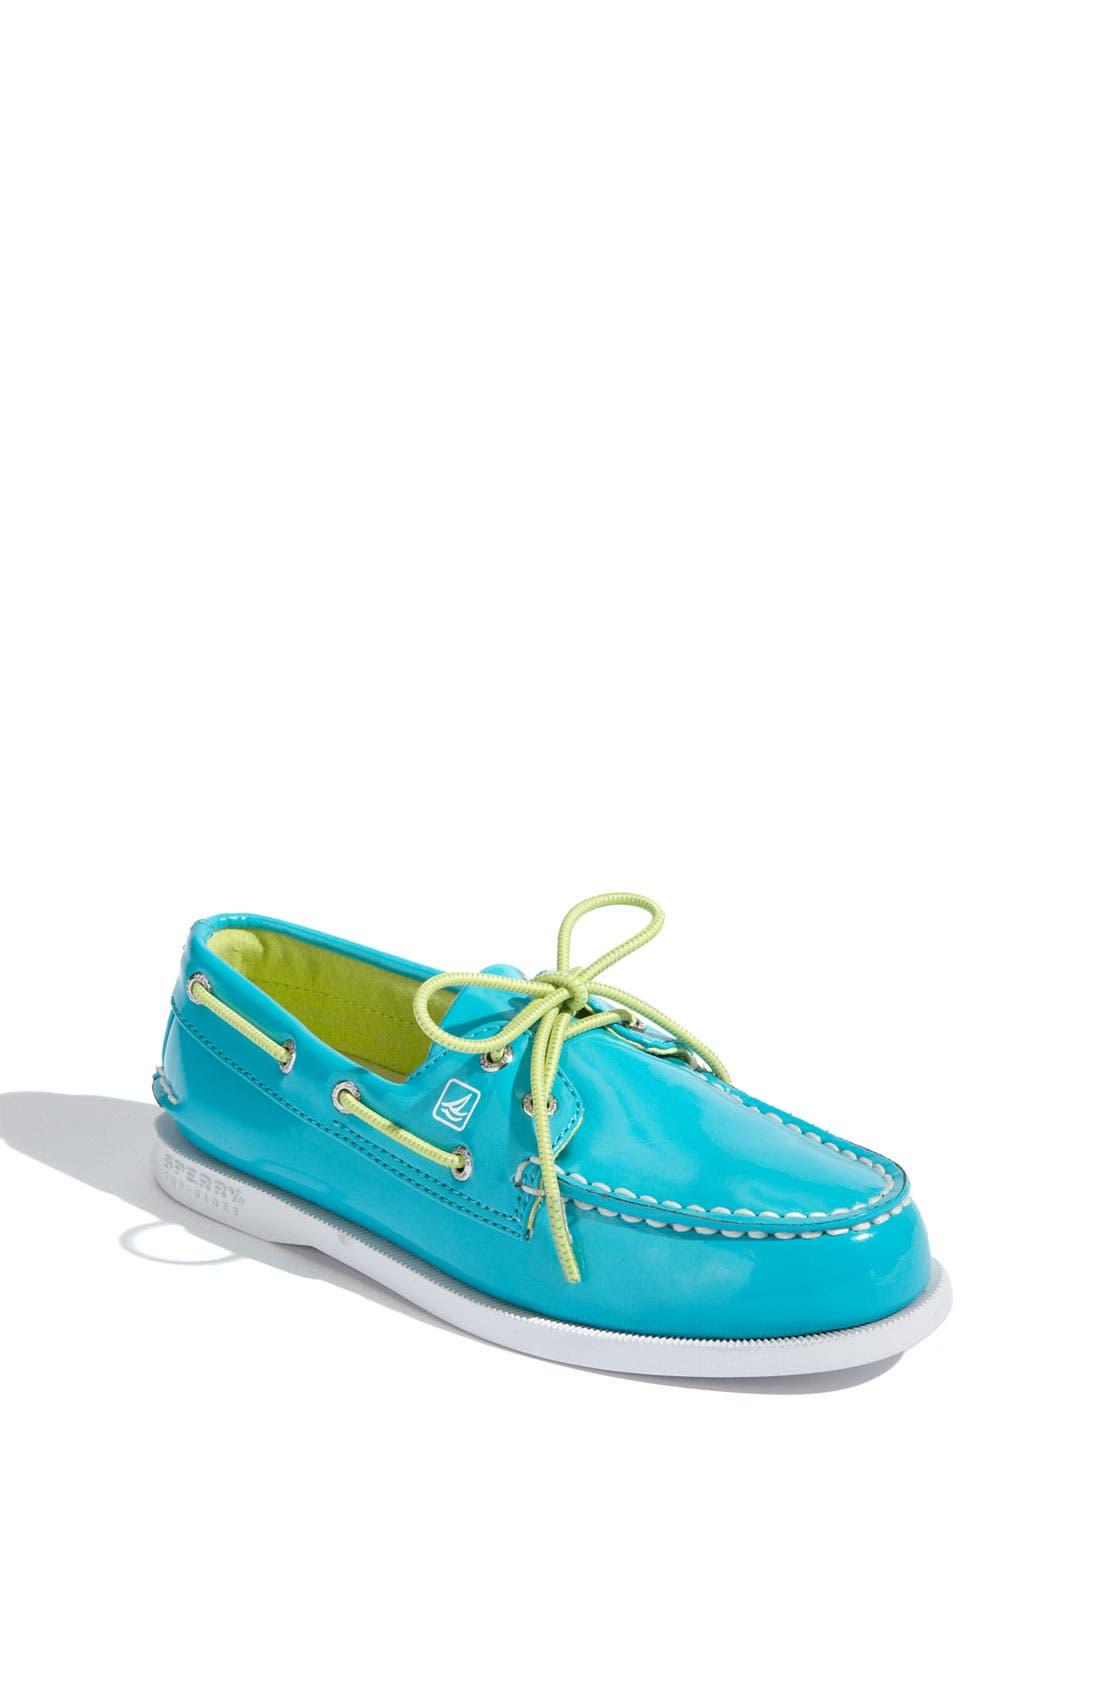 Alternate Image 1 Selected - Sperry Top-Sider® 'Authentic Original' Boat Shoe (Walker, Toddler, Little Kid & Big Kid)